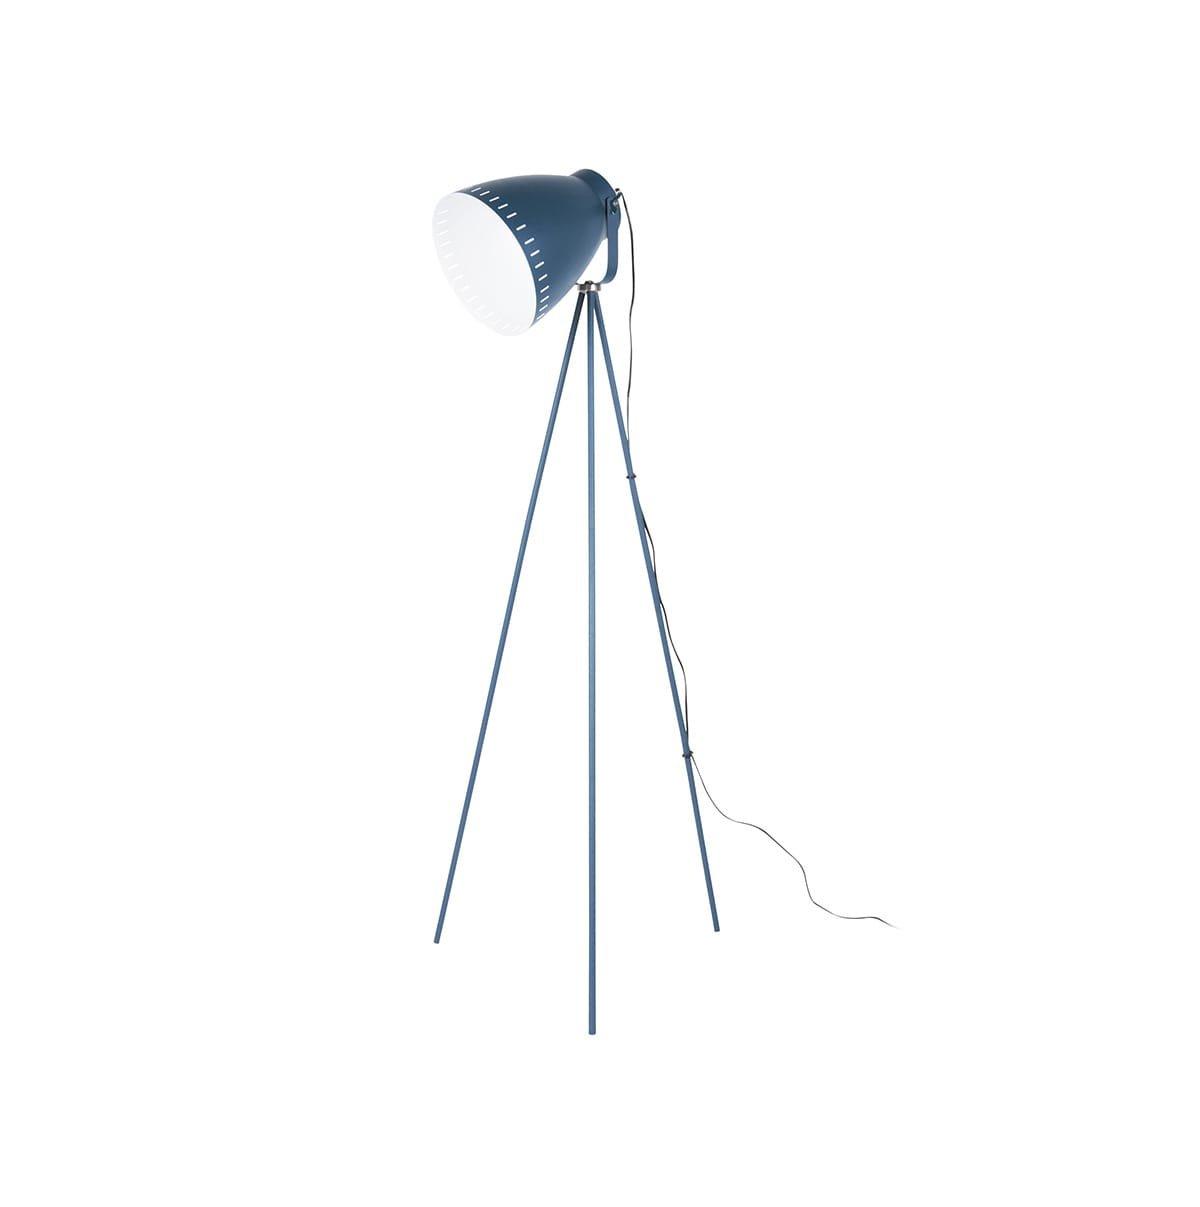 Stojací lampa Mingle 3 Legs Metal – tmavě modrá